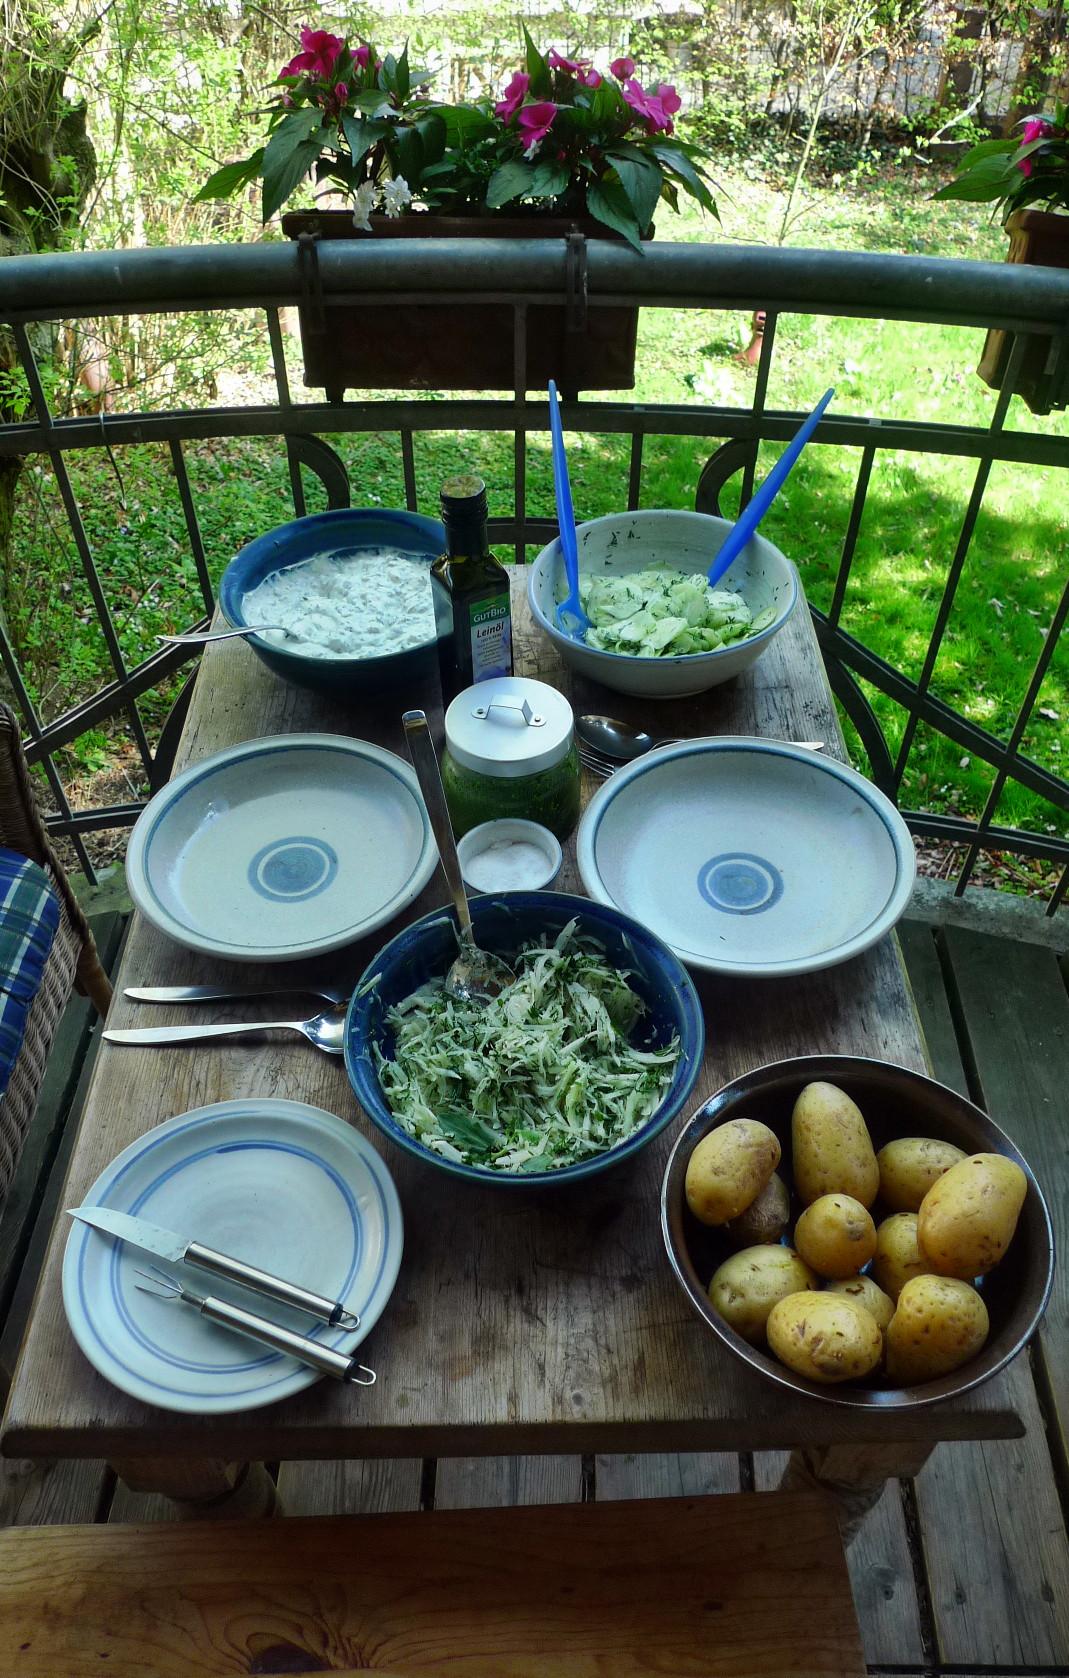 Quark,Kartoffeln,Salate - 24.4.15   (3)